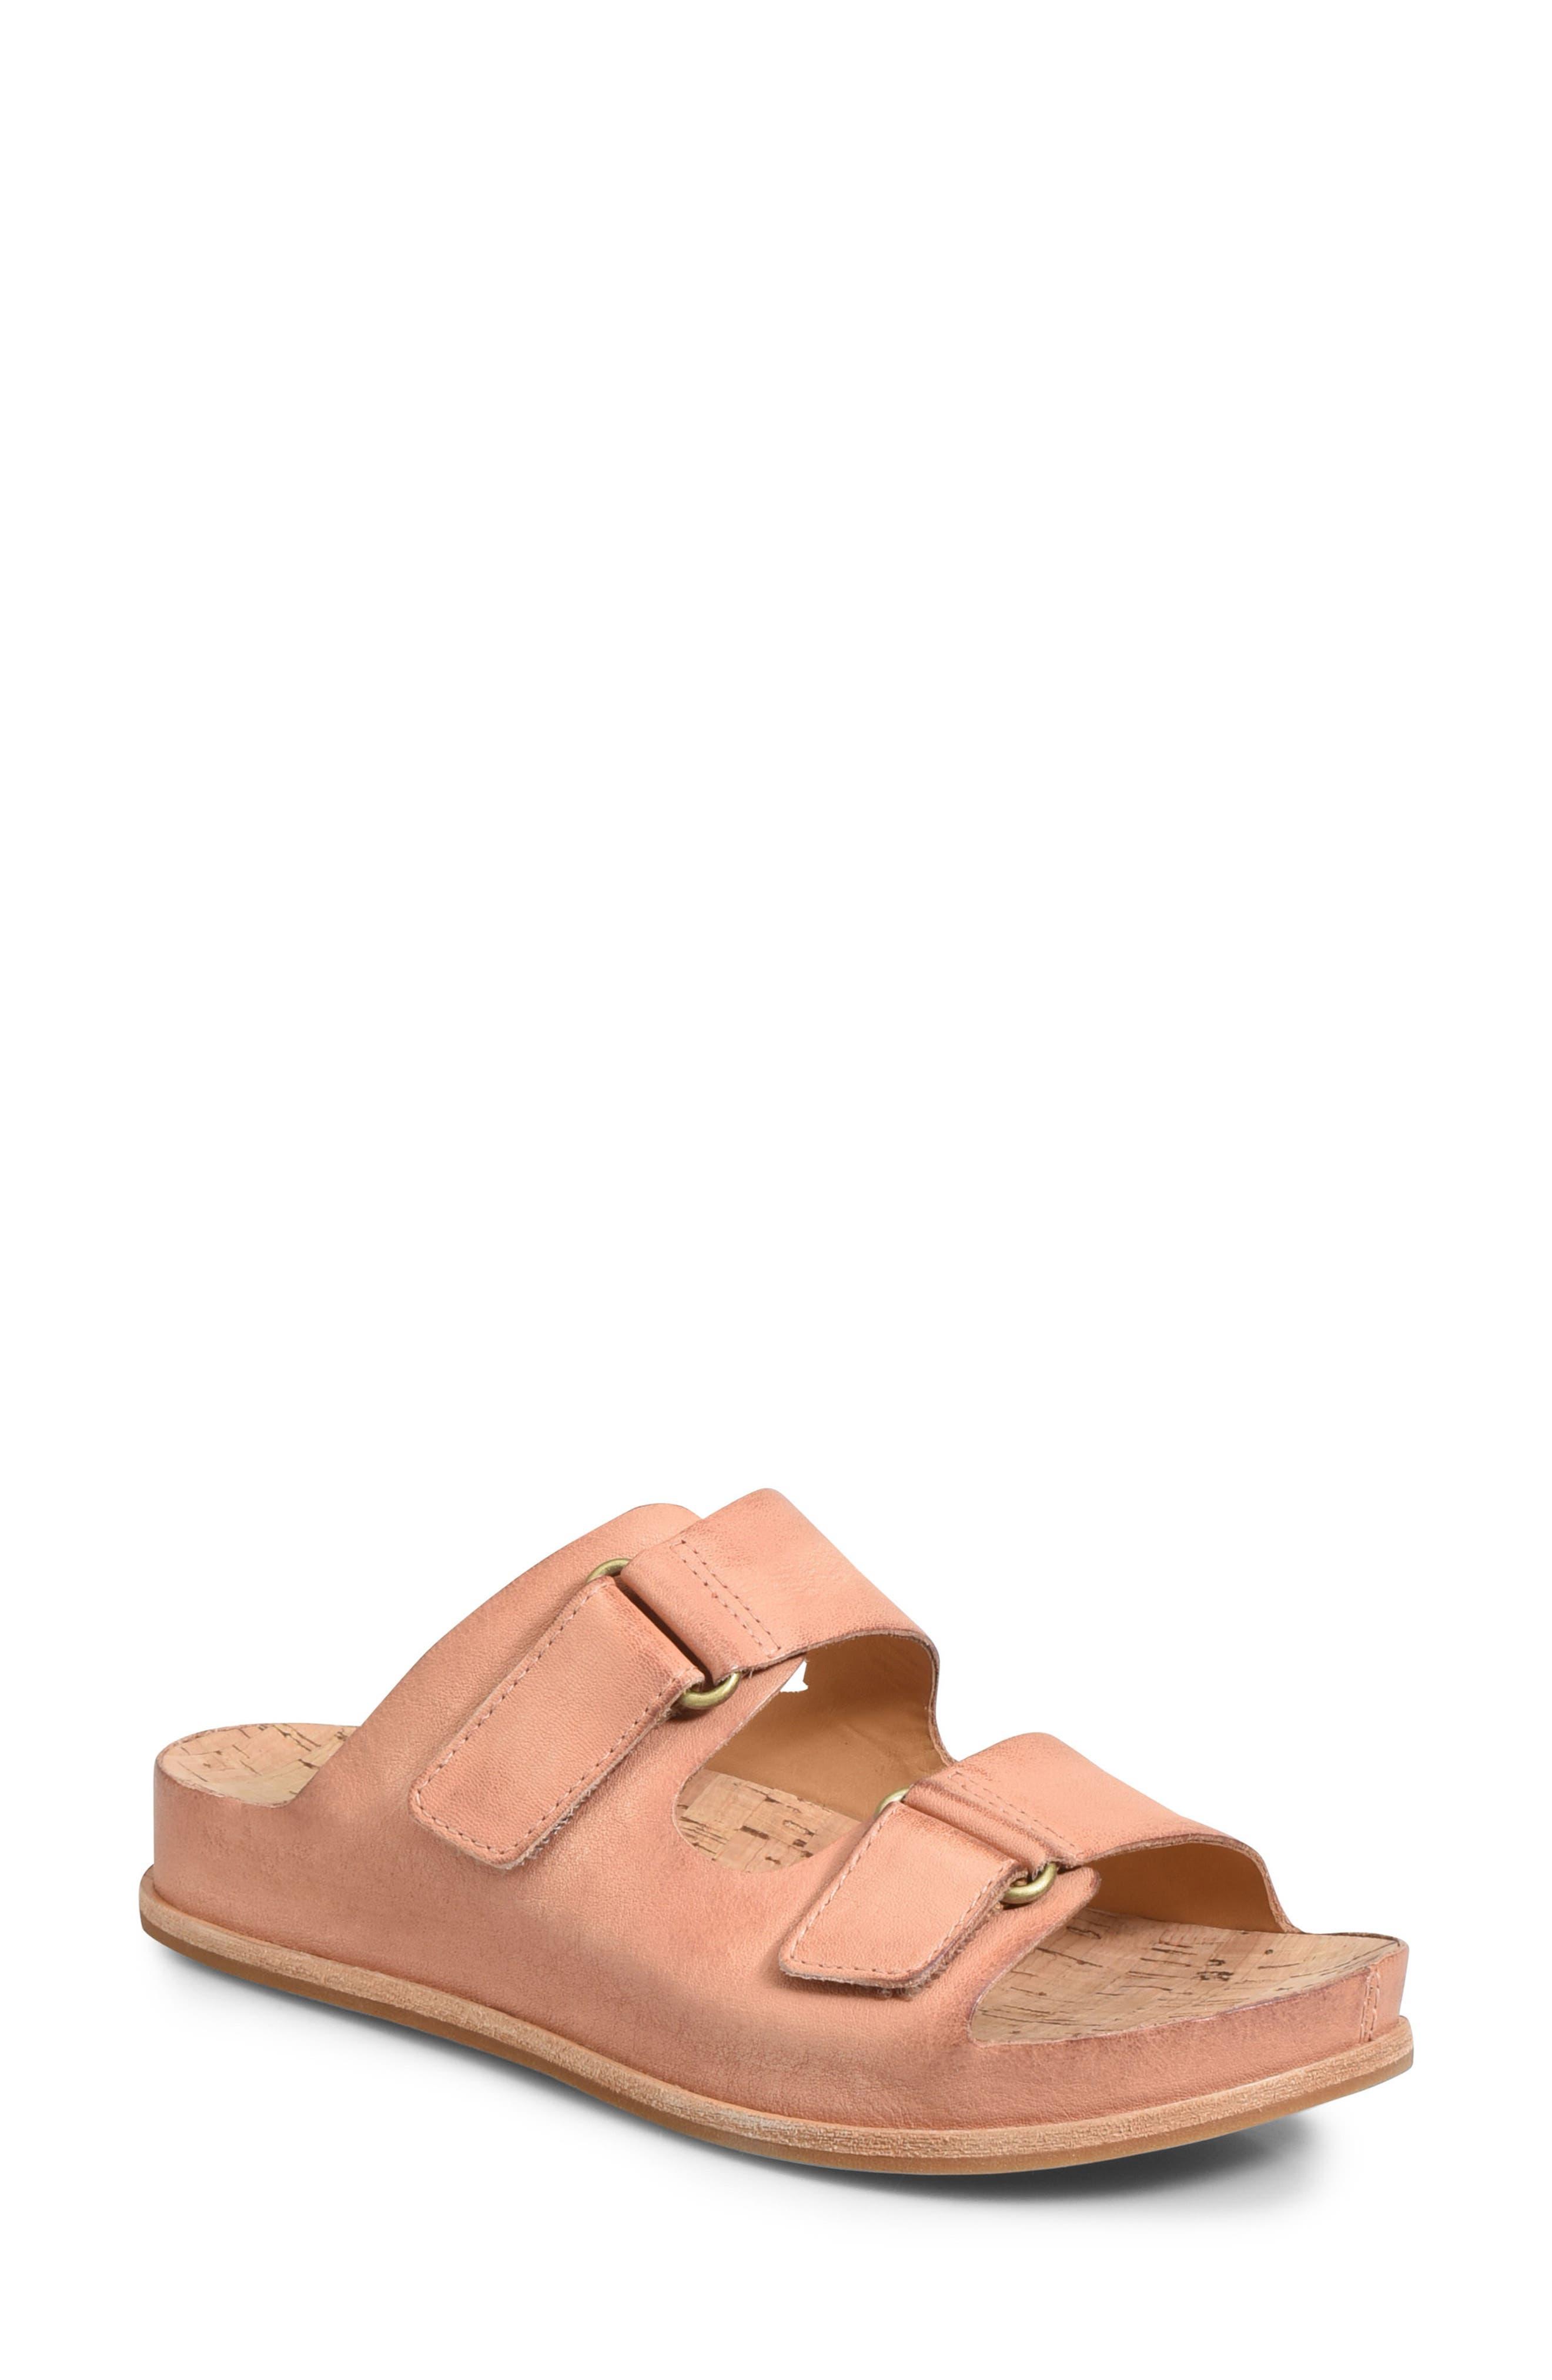 Kork-Ease Torreya Slide Sandal, Pink